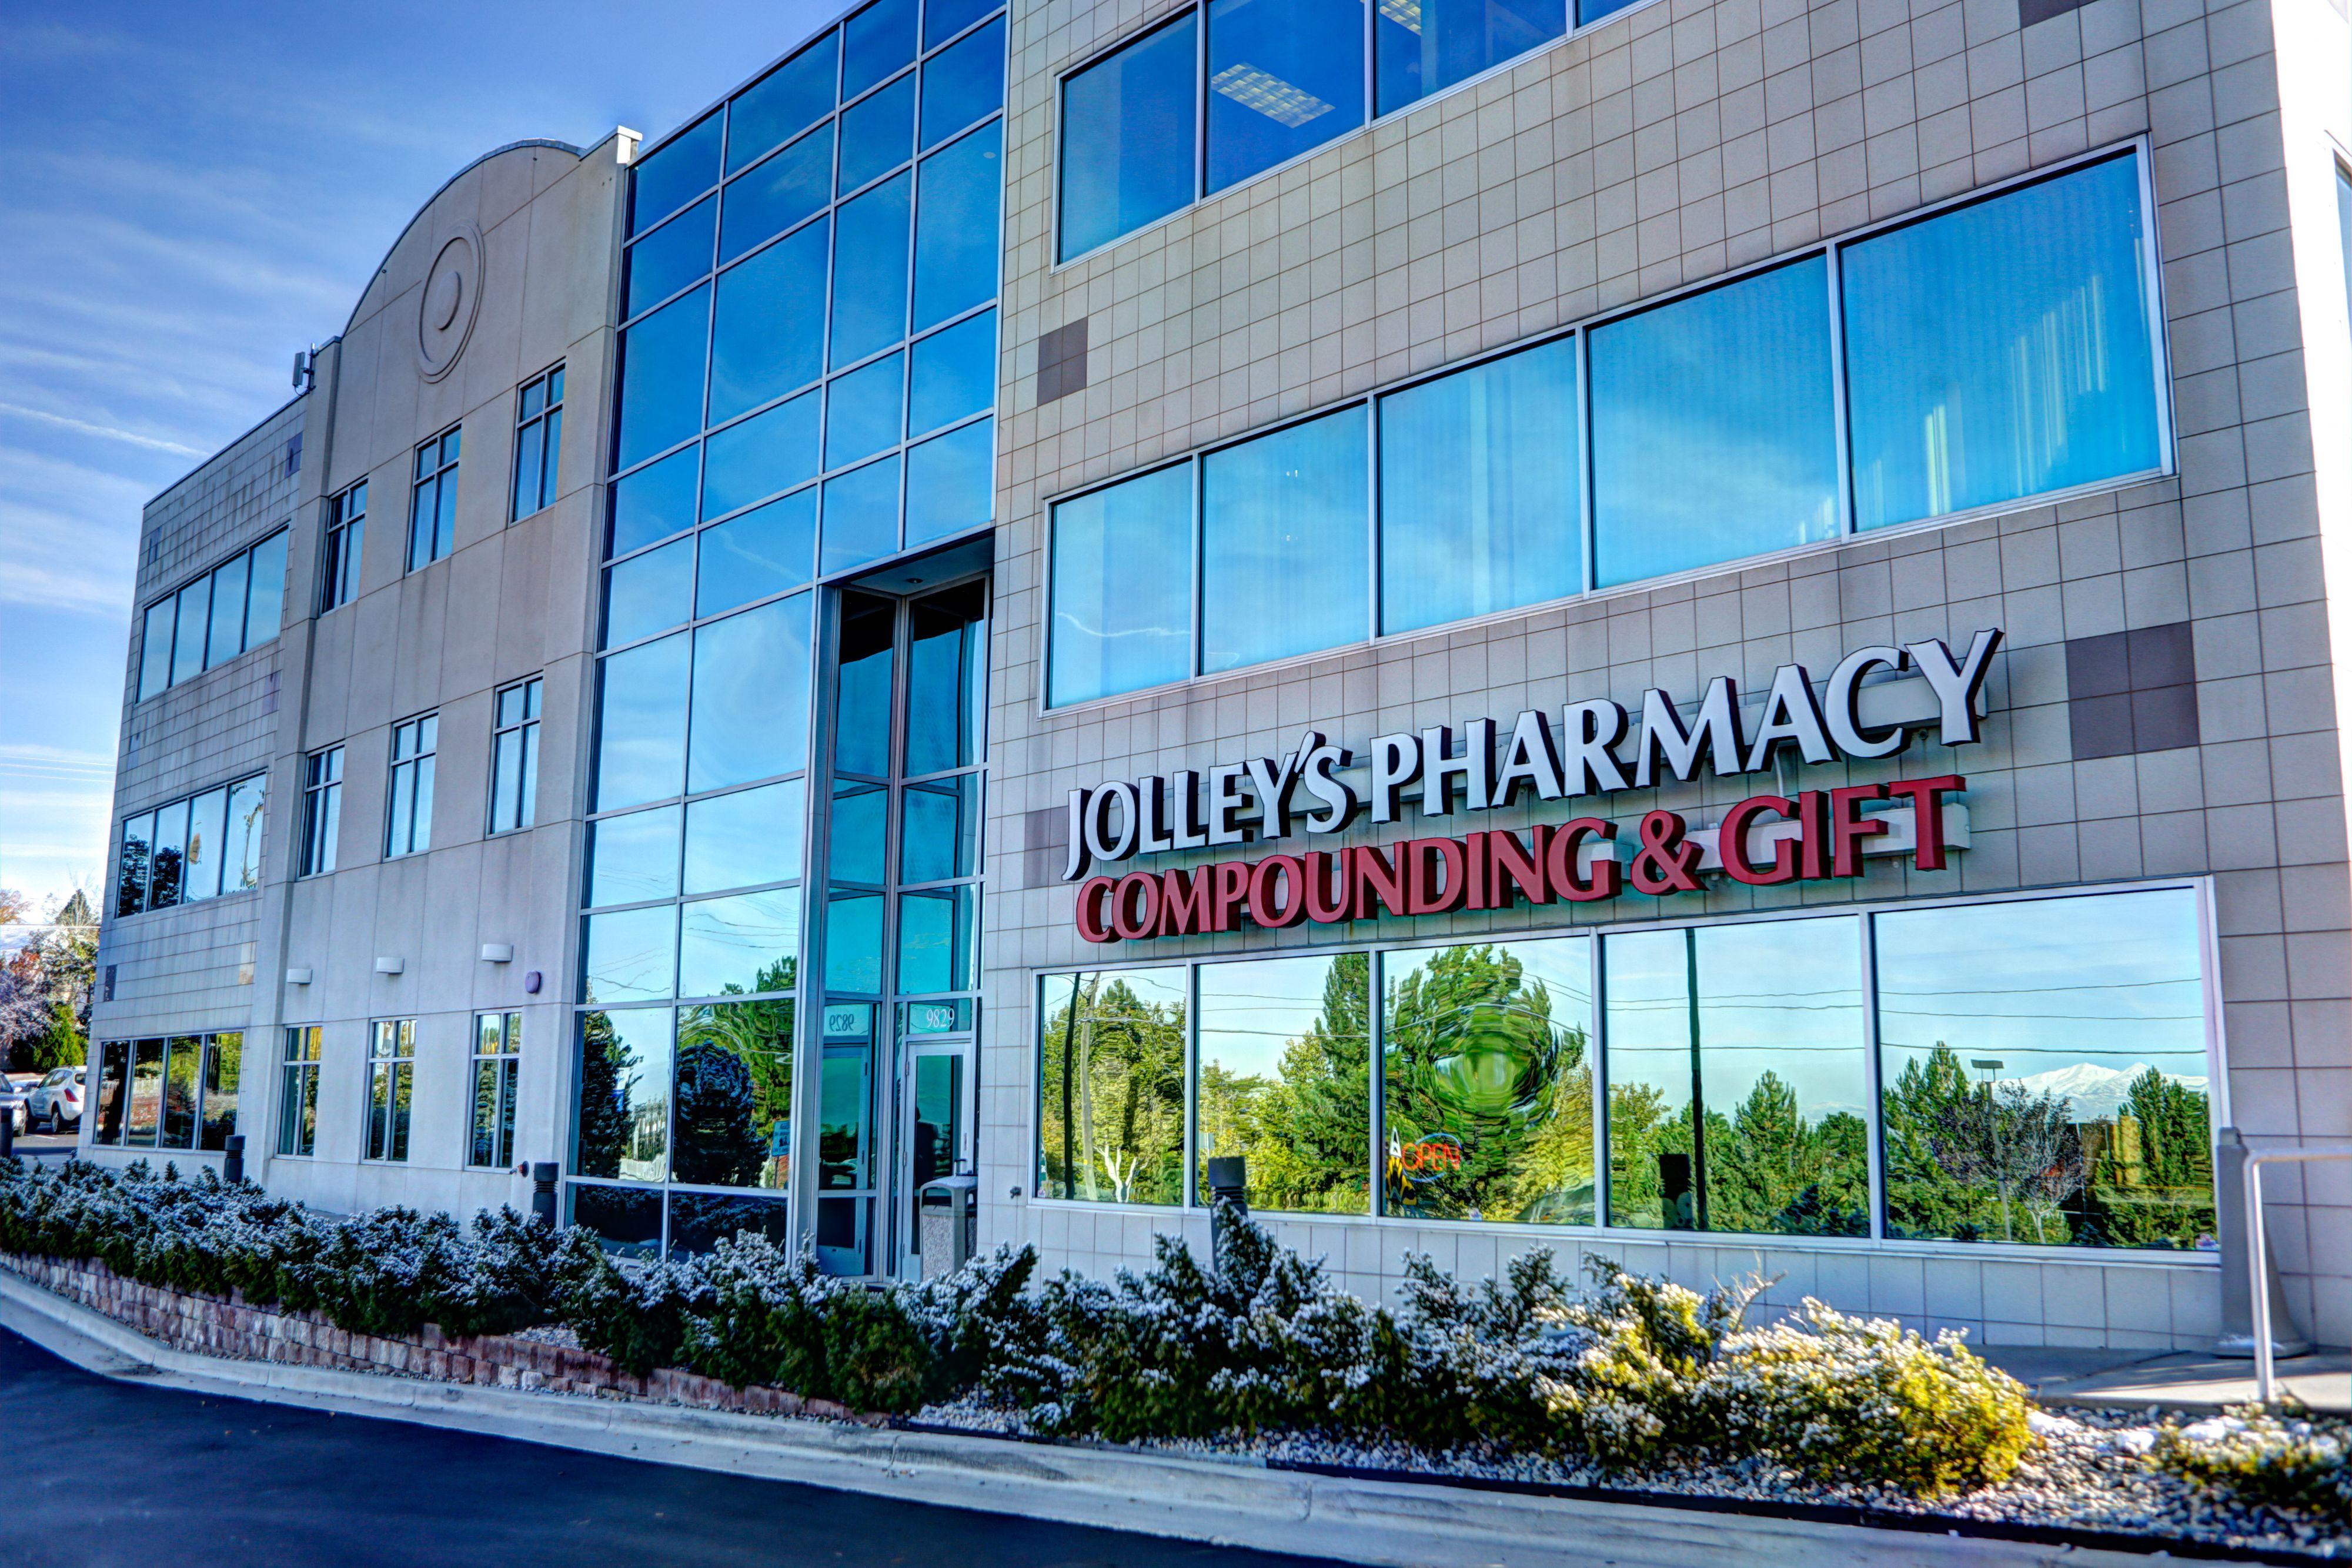 Jolley's Sandy Compounding Pharmacy